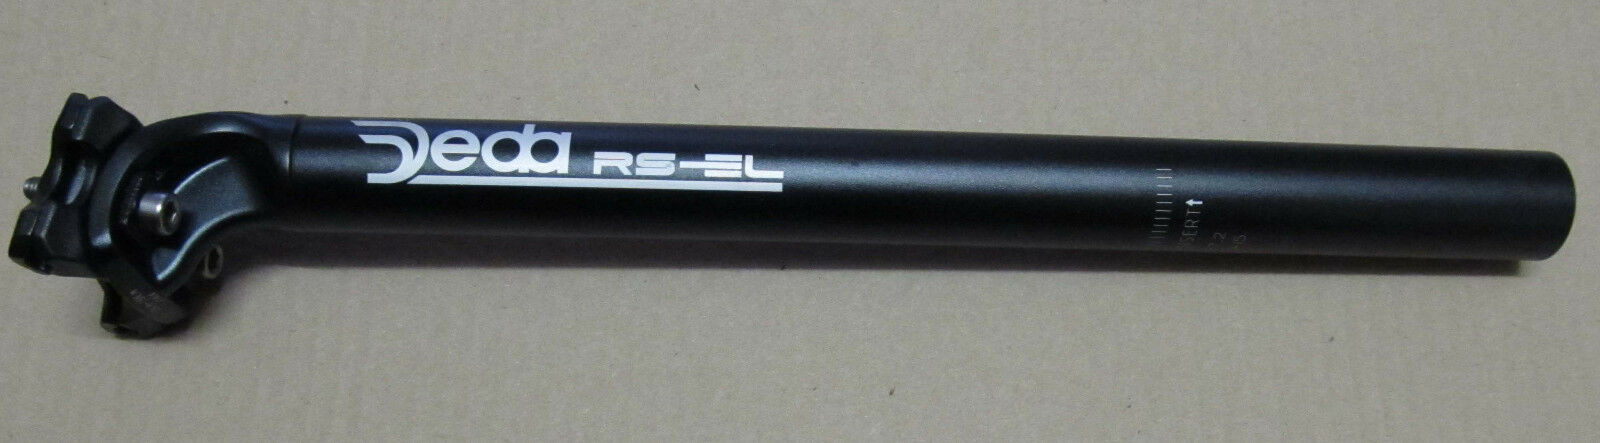 Deda Deda Deda Elementi Rs El Alluminio Reggisella MTB da Corsa Singlespeed 27,2mm 350mm b3a873